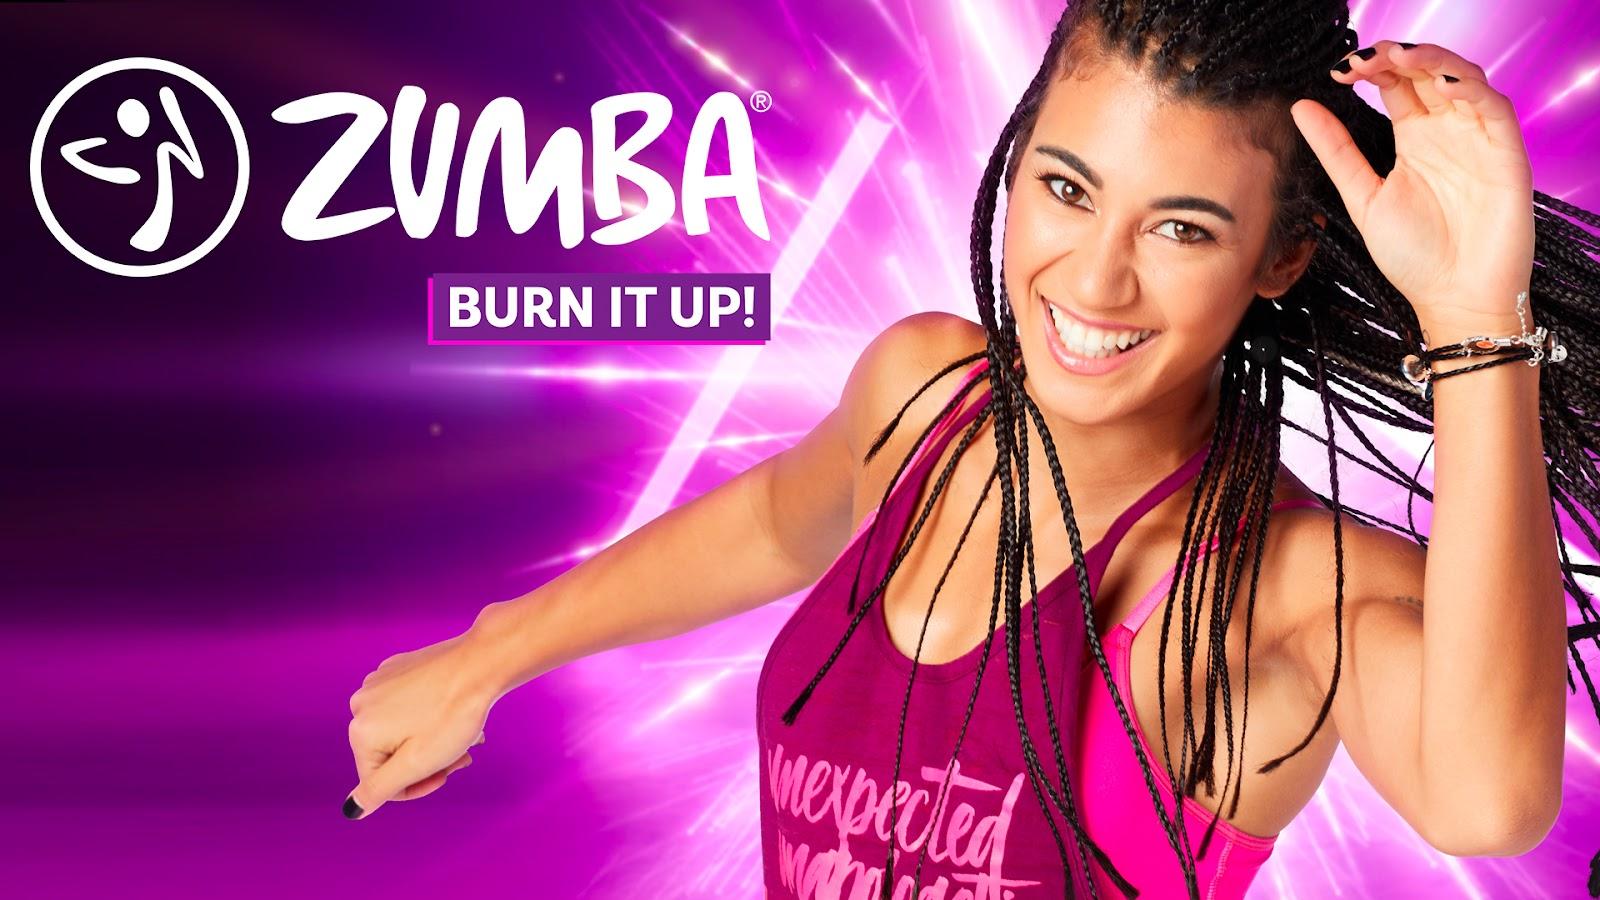 Resultado de imagem para Zumba Burn It Up!